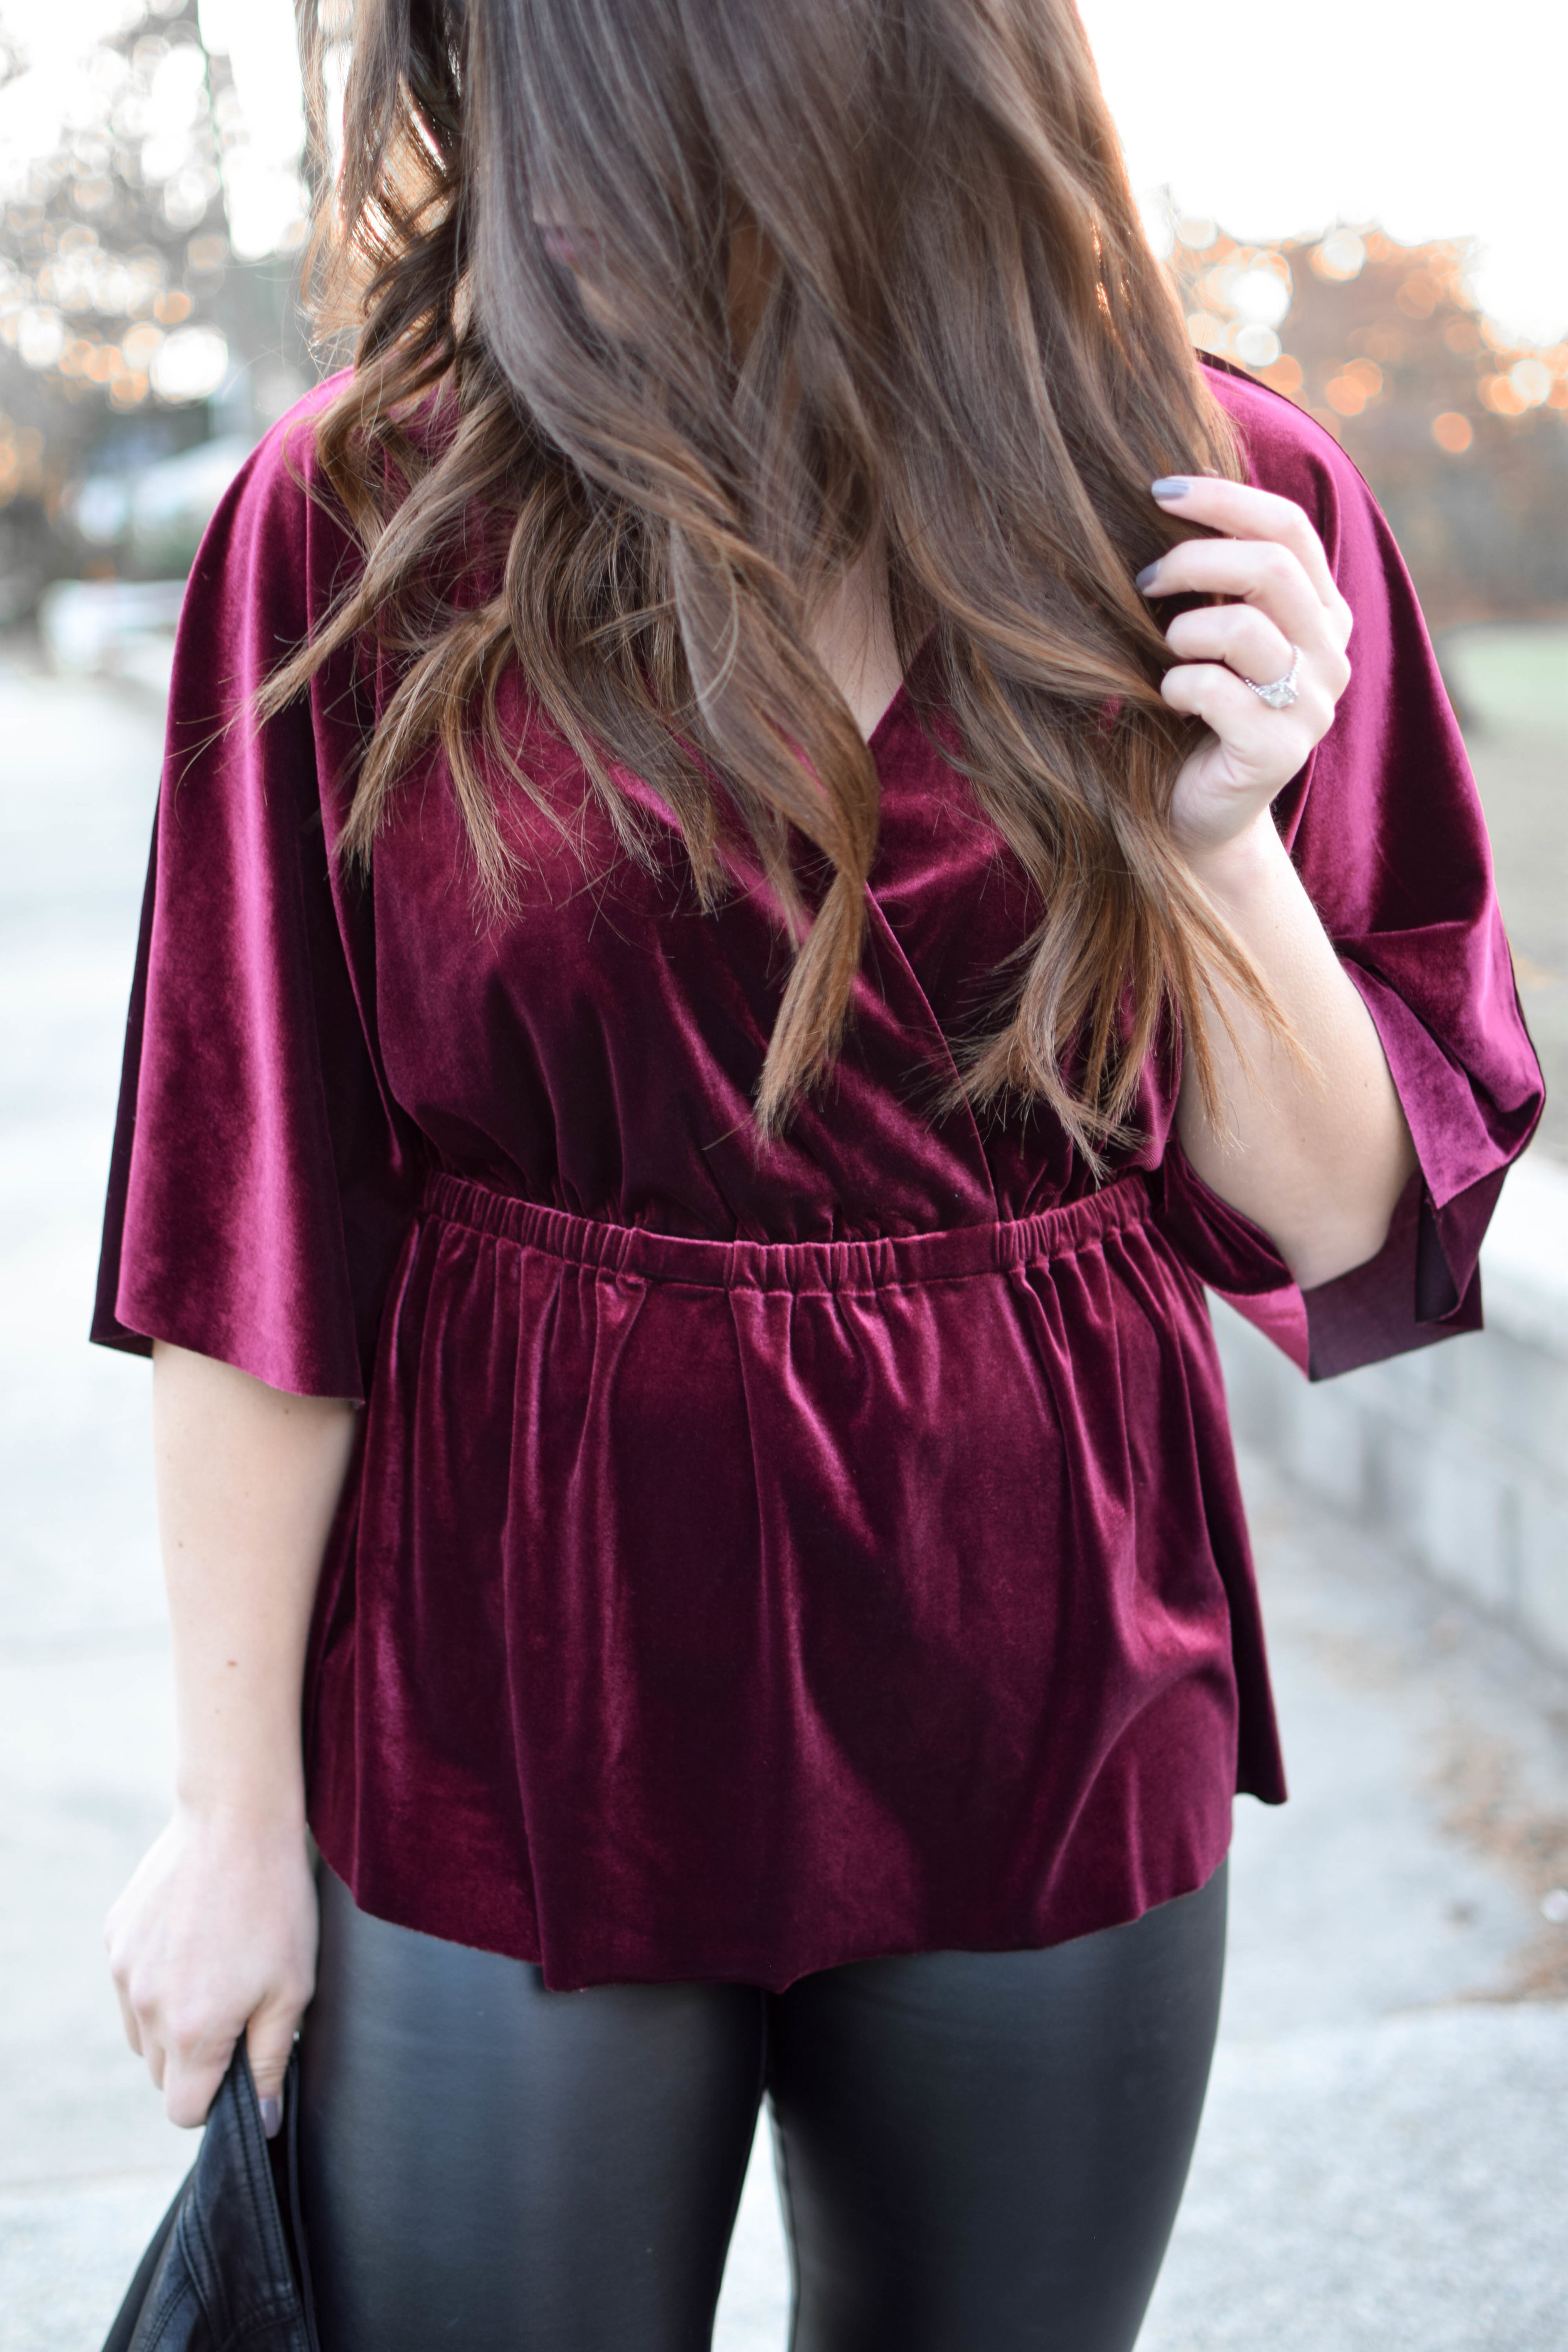 Holiday Outfit Idea #1: Velvet | Pine Barren Beauty | winter fashion, winter style, holiday fashion, velvet top, faux leather pants